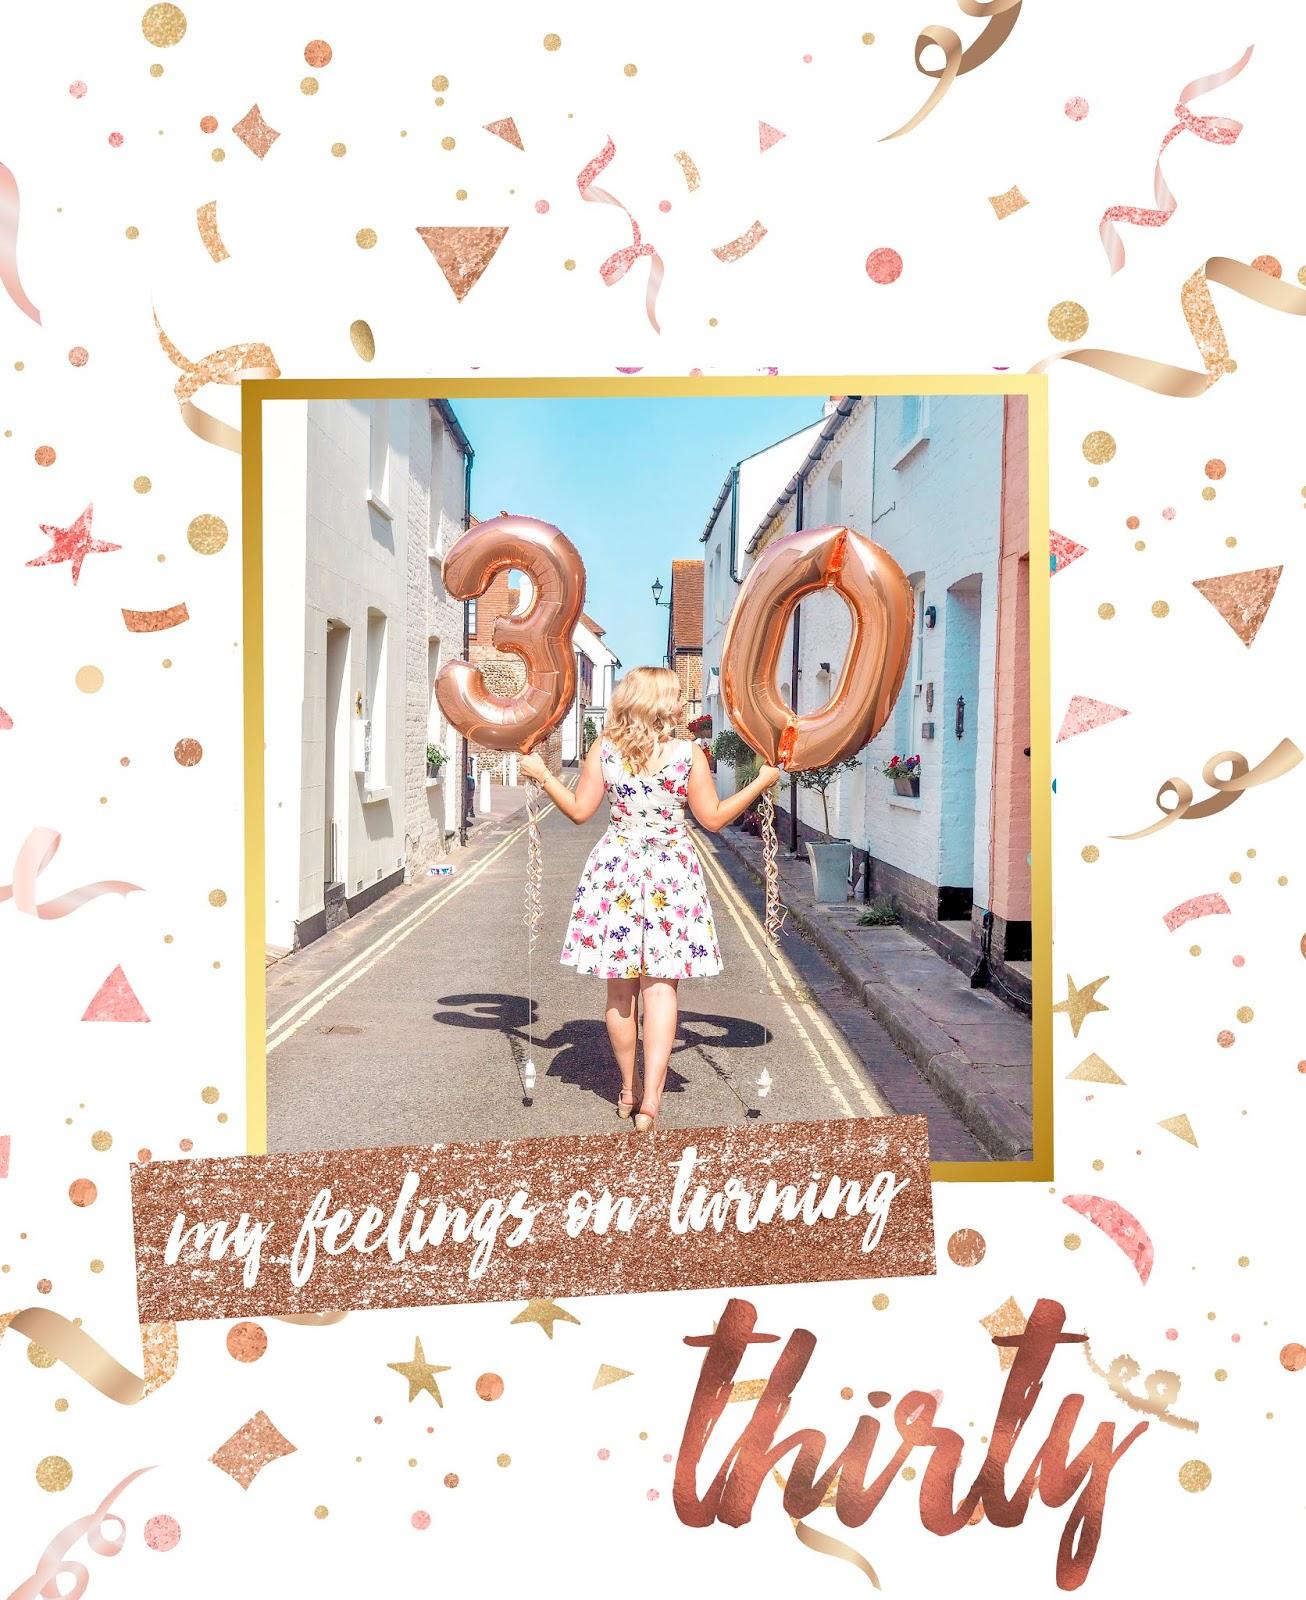 My Feelings On Turning 30, Katie Kirk Loves, UK Blogger, 30th Birthday, 30 Flirty and Thriving, UK Fashion Blogger, UK Lifestyle Blogger, Turning 30 In Style, Over 30s Fashion, 30 and Fabulous, Milestone Birthday, Party Blogger, Vintage Tea Dress, Pin It, Pinterest Worthy